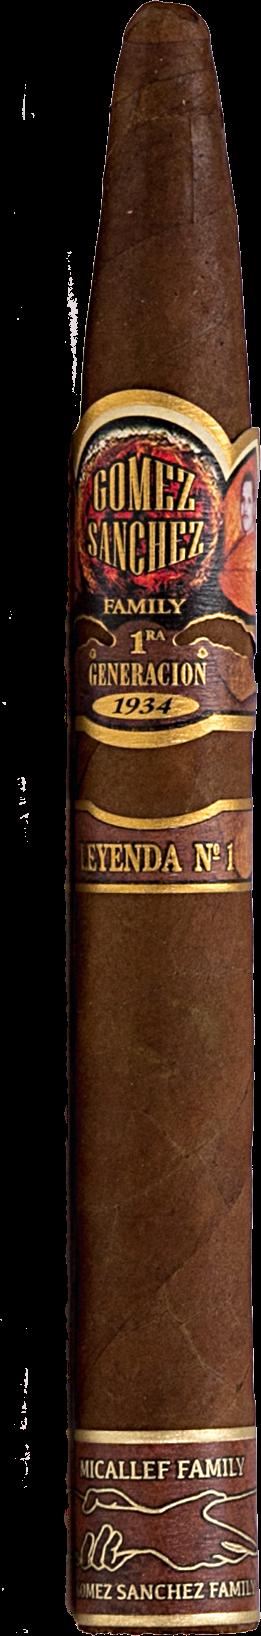 Leyenda No. 1 Single.jpg